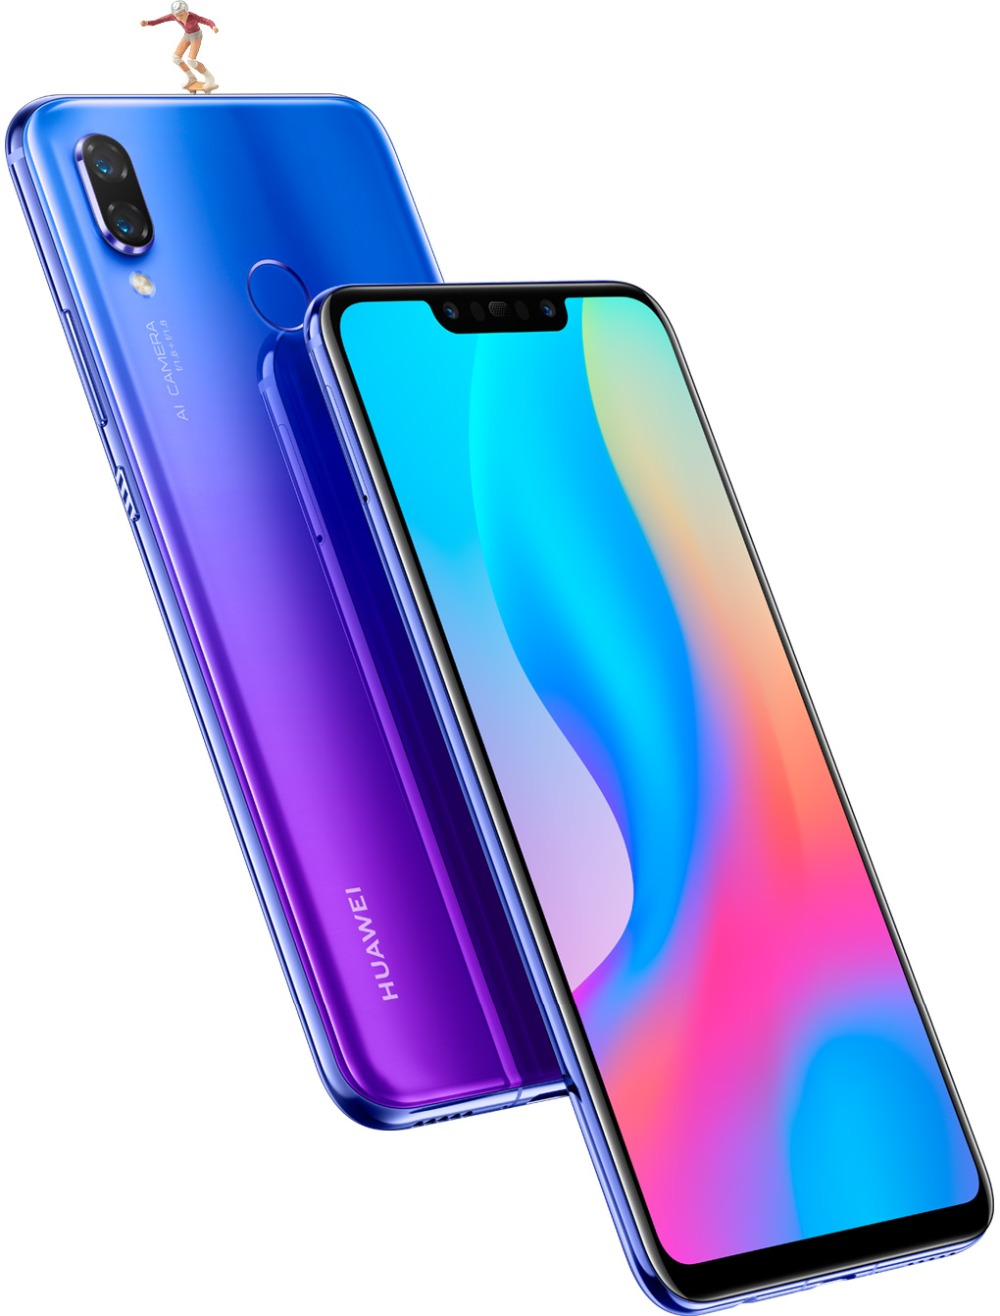 Huawei nova 3 nova 3 6 ГБ ОЗУ 64 ГБ/128 ГБ ПЗУ мобильный телефон Kirin 970 Qcta-core Dual фронтальная/задняя камера 24.0MP + 2.0MP 24.0MP + 16.0MP